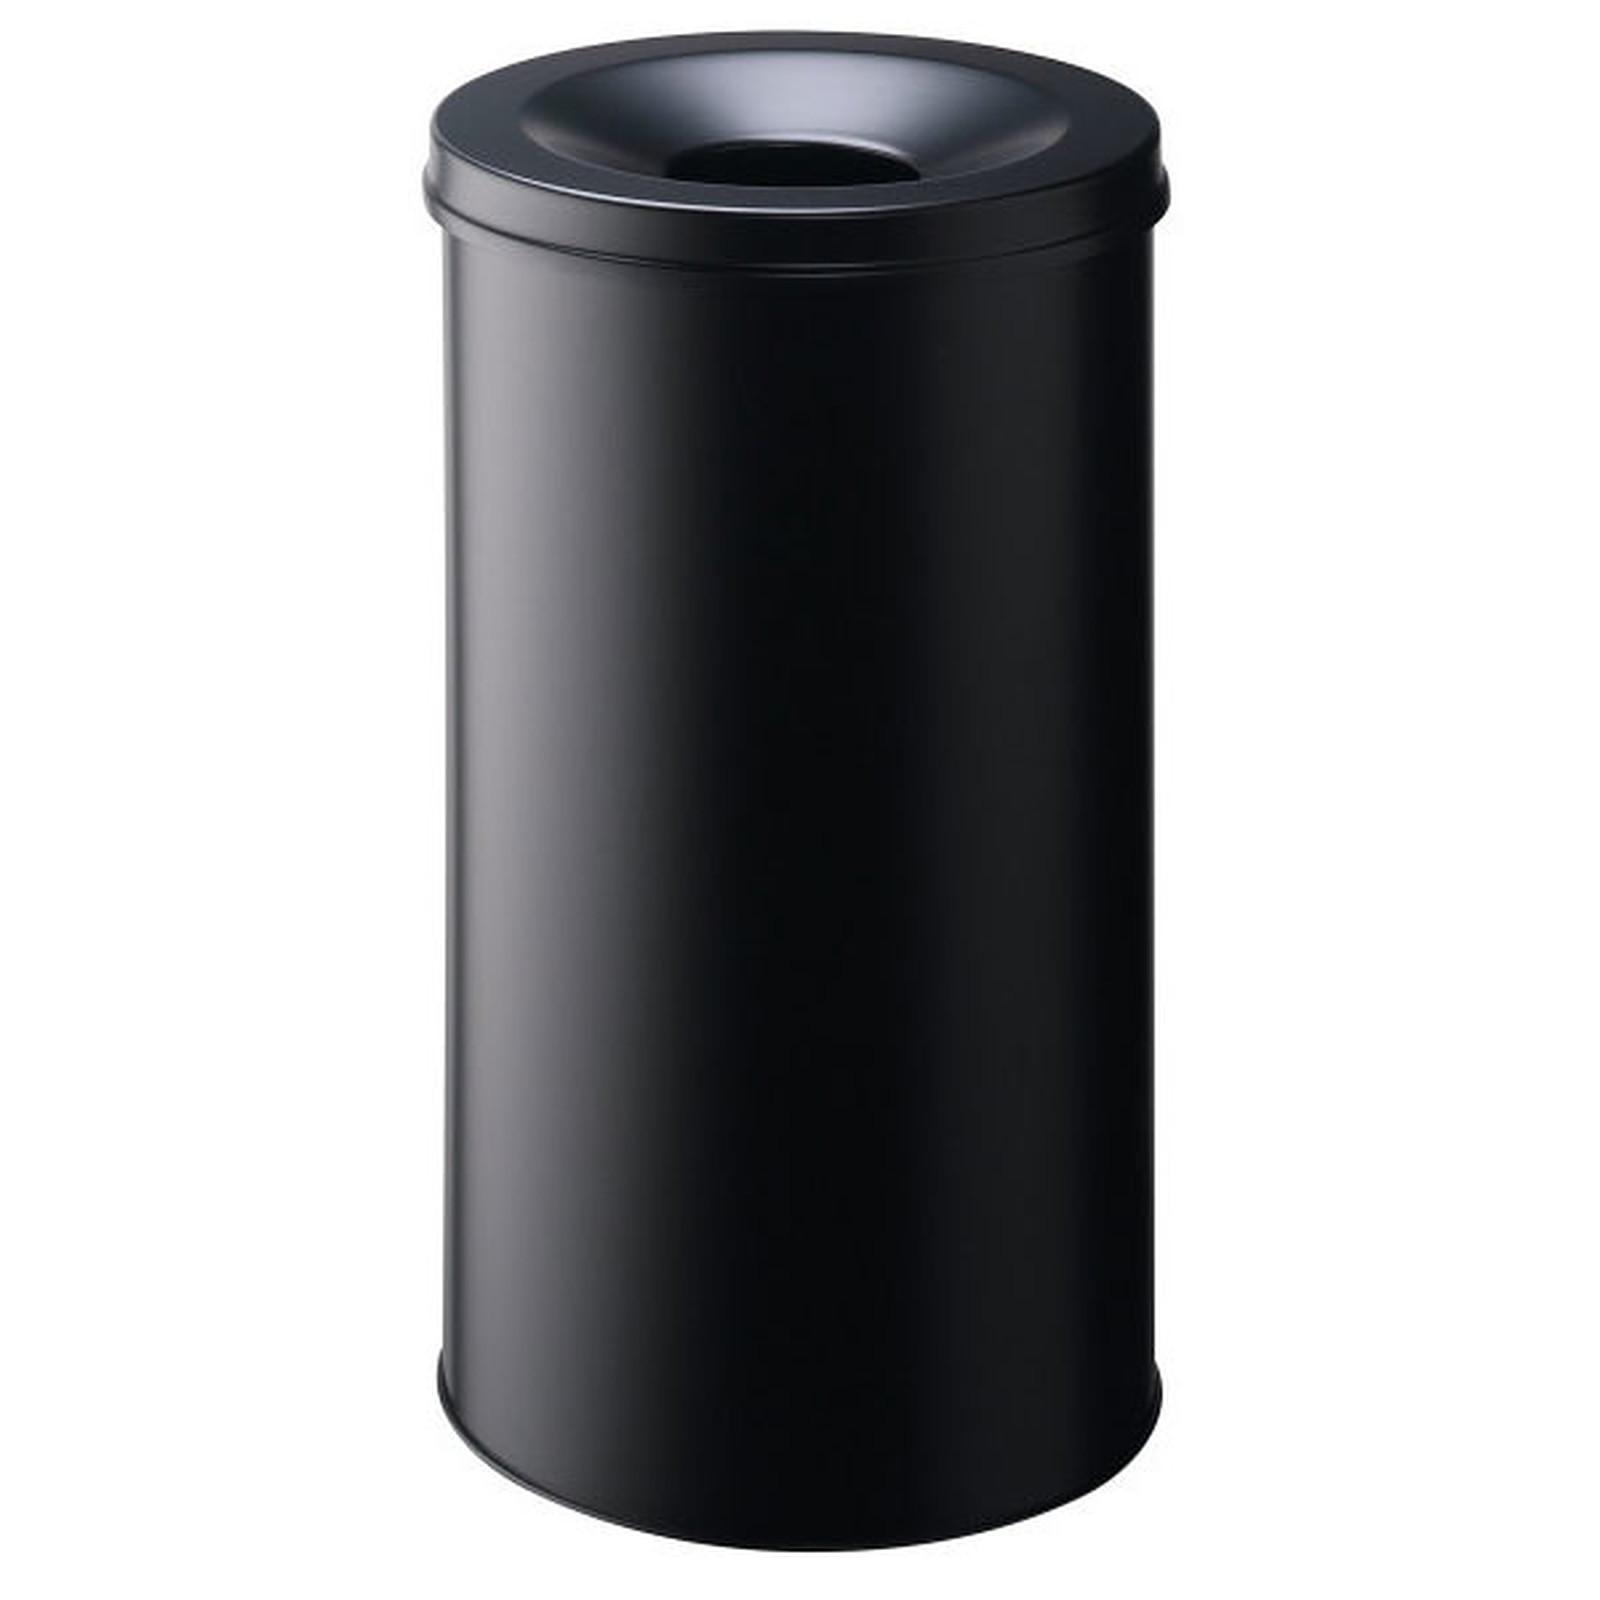 DURABLE Corbeille anti-feu 60 litres Noir